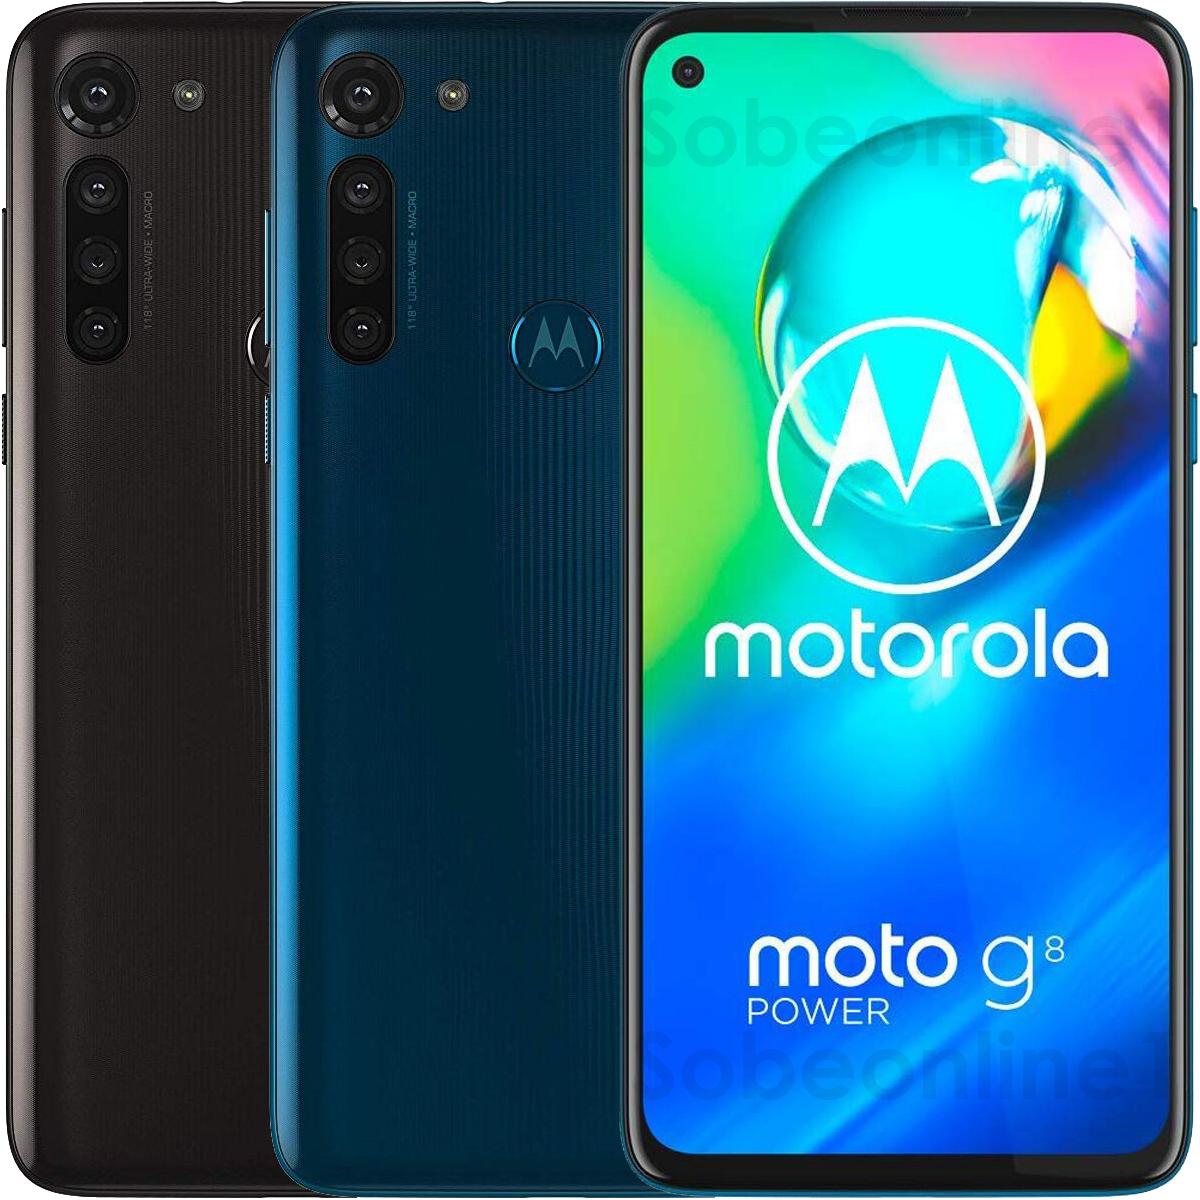 Motorola Moto G8 Power 64gb 4gb Ram Xt2041 1 Factory Unlocked 6 4 Dual Sim Ebay